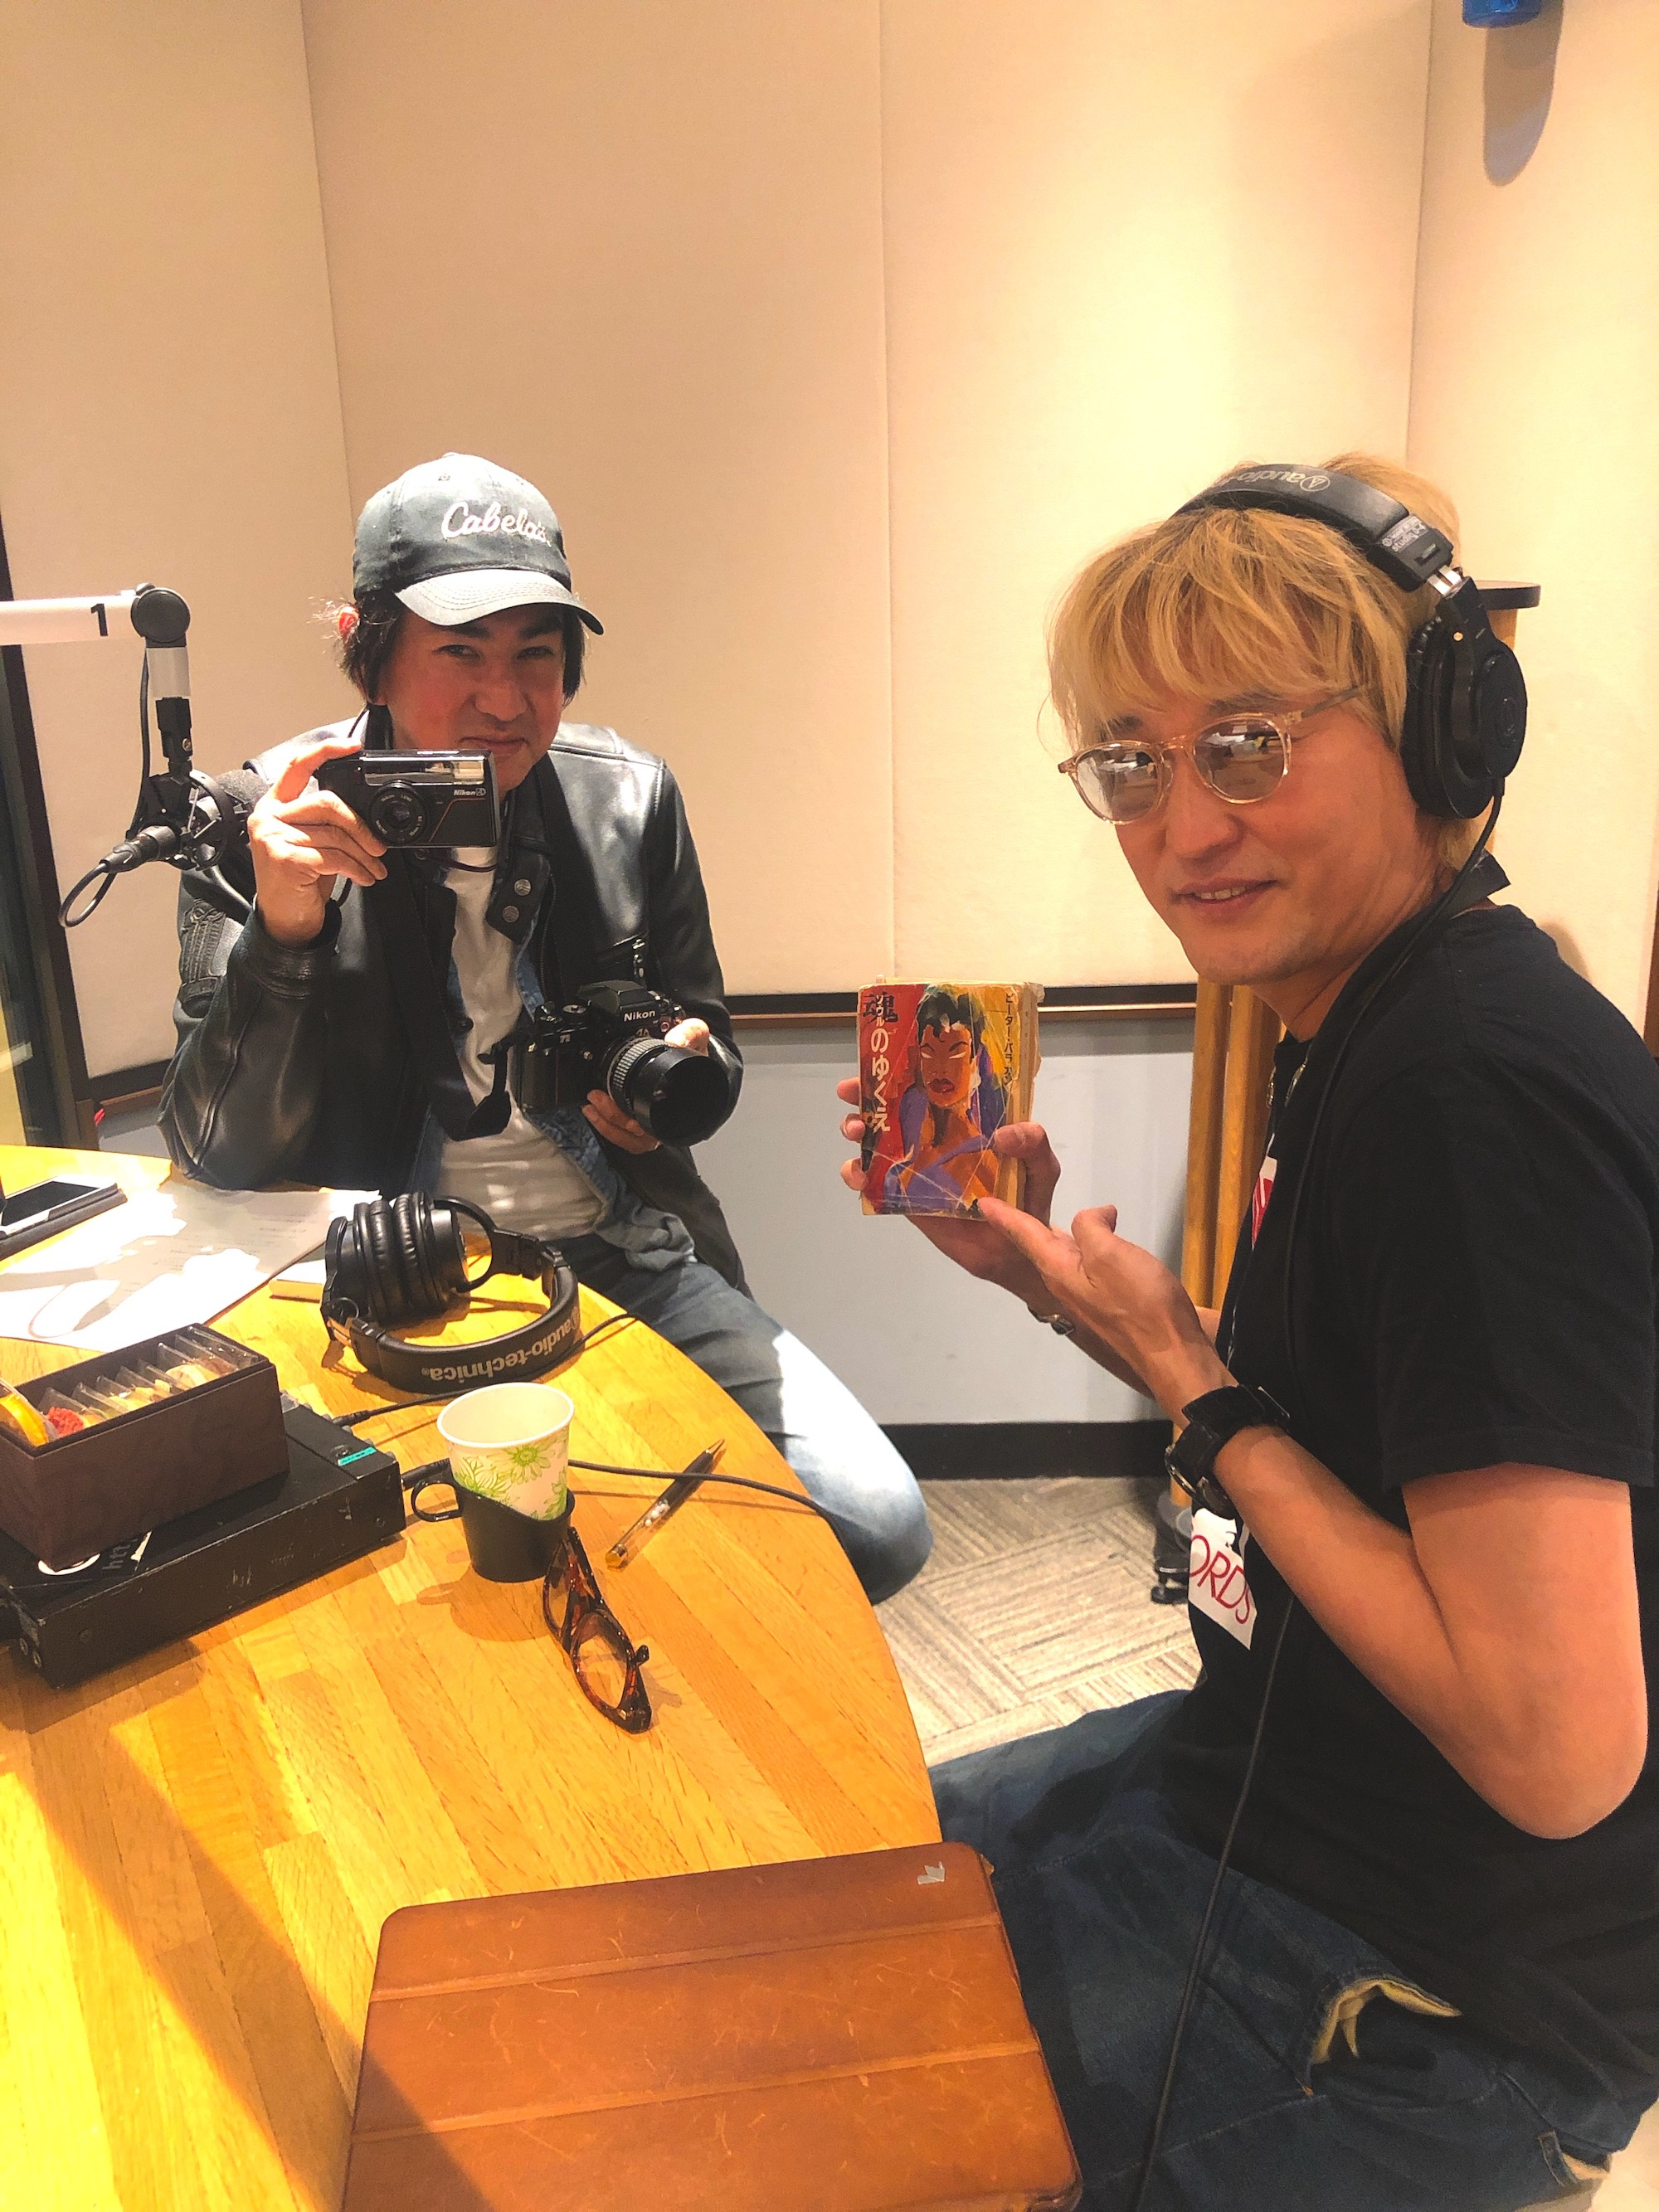 J-WAVEで放送中の『Mercedes-Benz THE EXPERIENCE』(ナビゲーター:スガ シカオ) ゲストは田島貴男